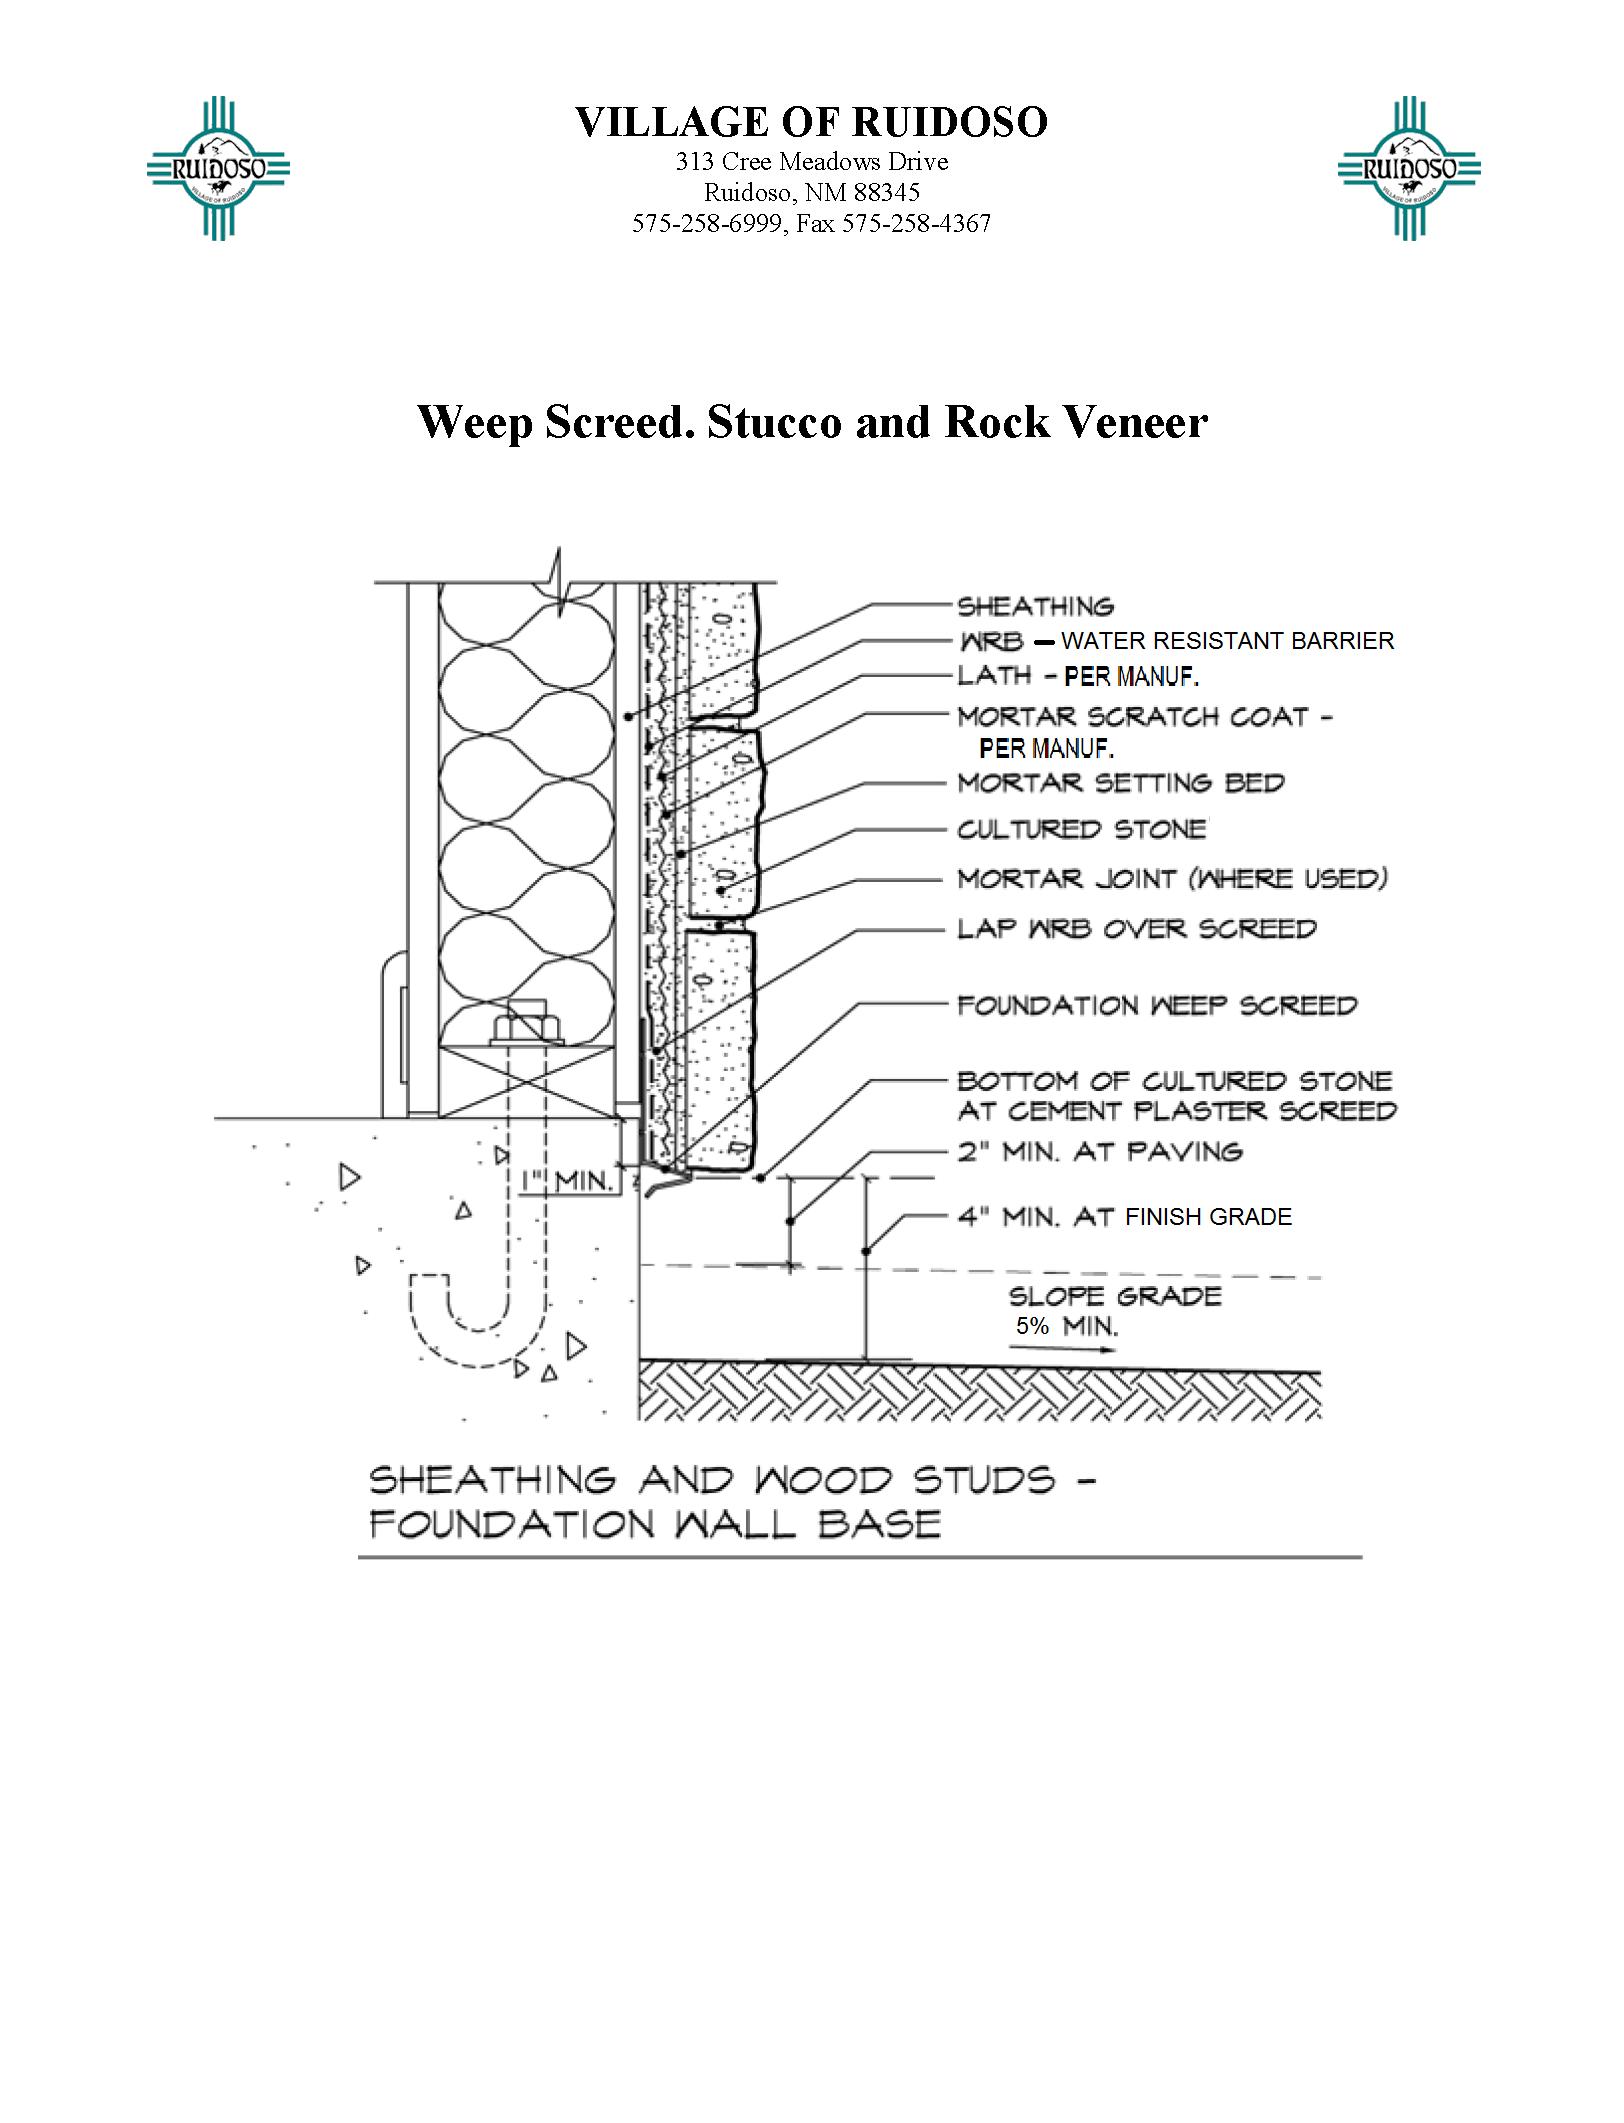 Building Permits & Inspections — Ruidoso NM